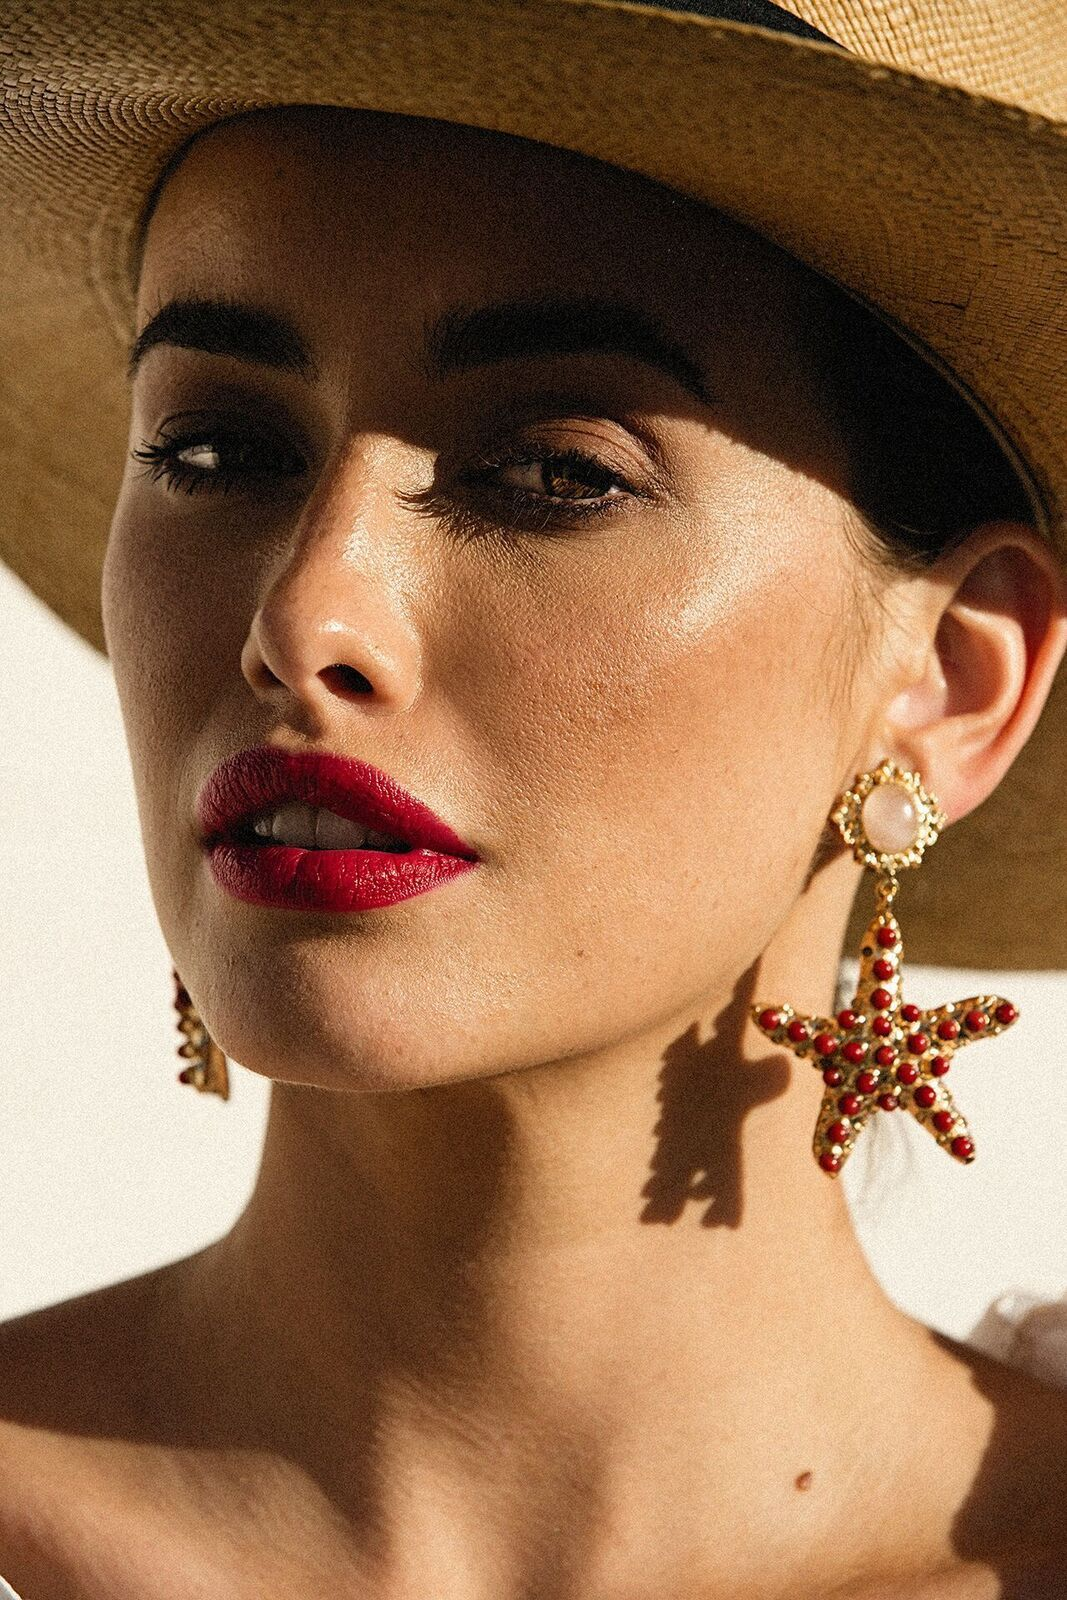 Sofia Earrings Red Christie Nicolaides Earrings, Ear